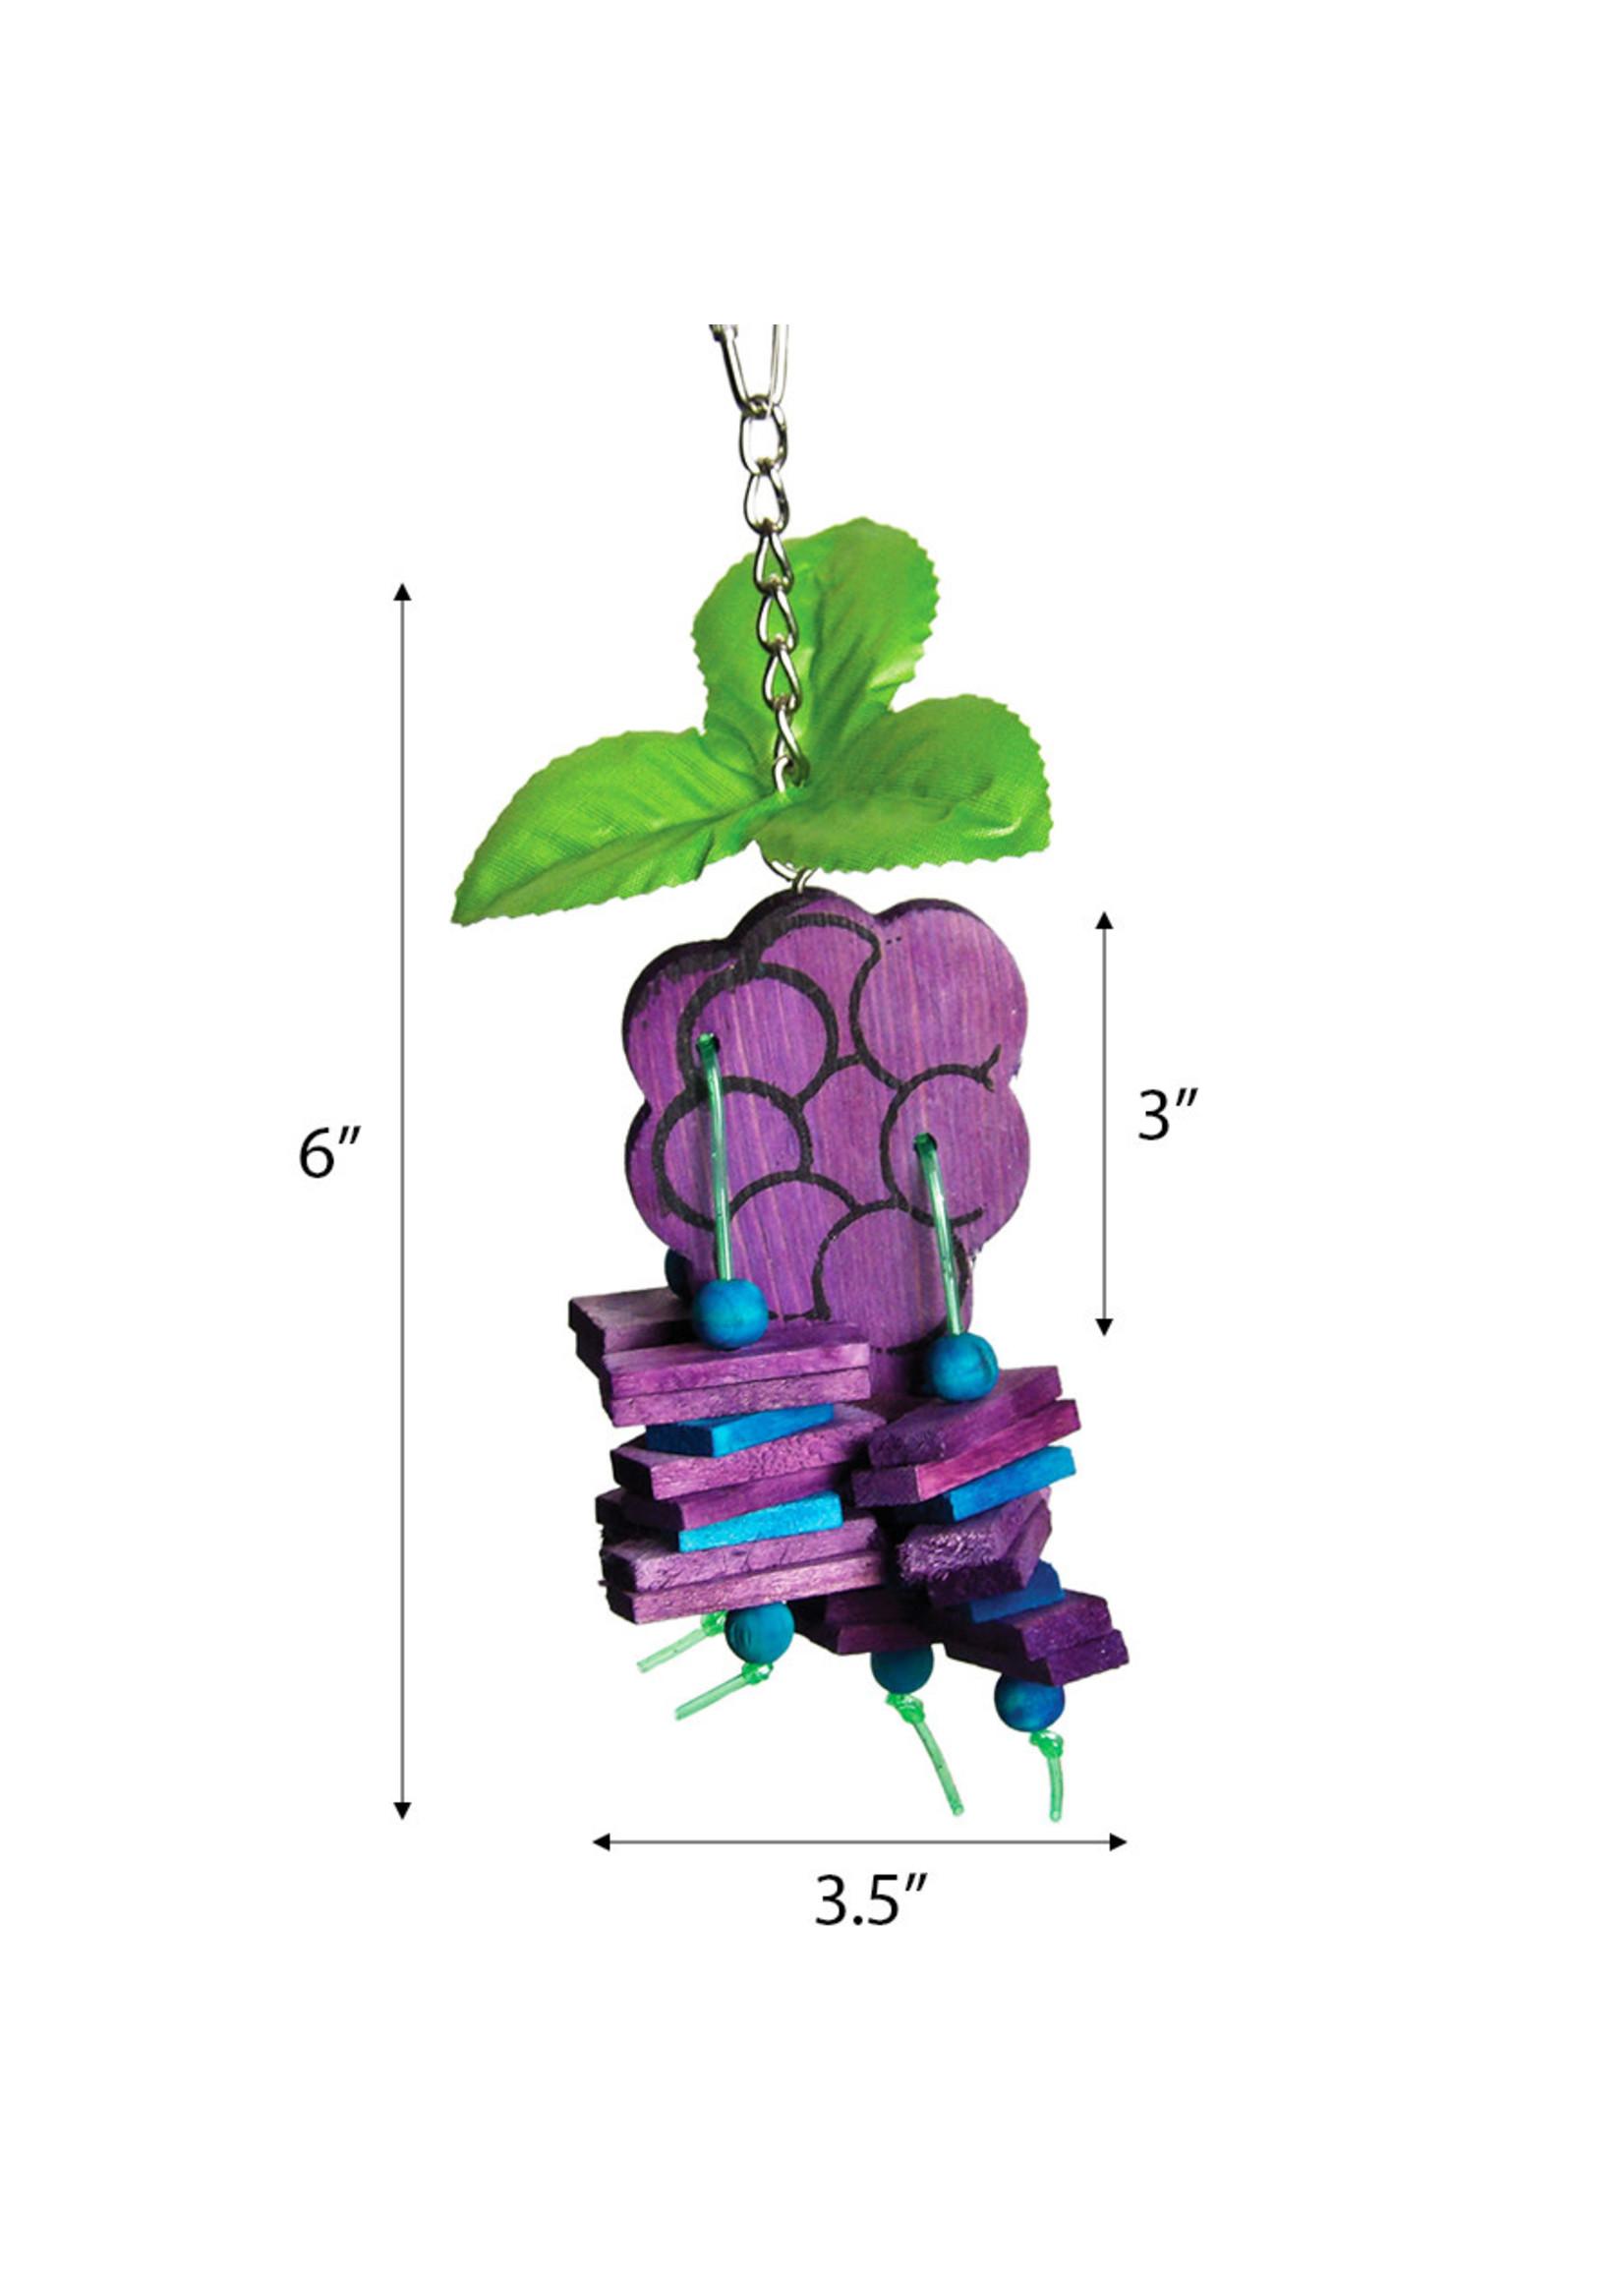 A&E Small Grapes Bird Toy HB01420